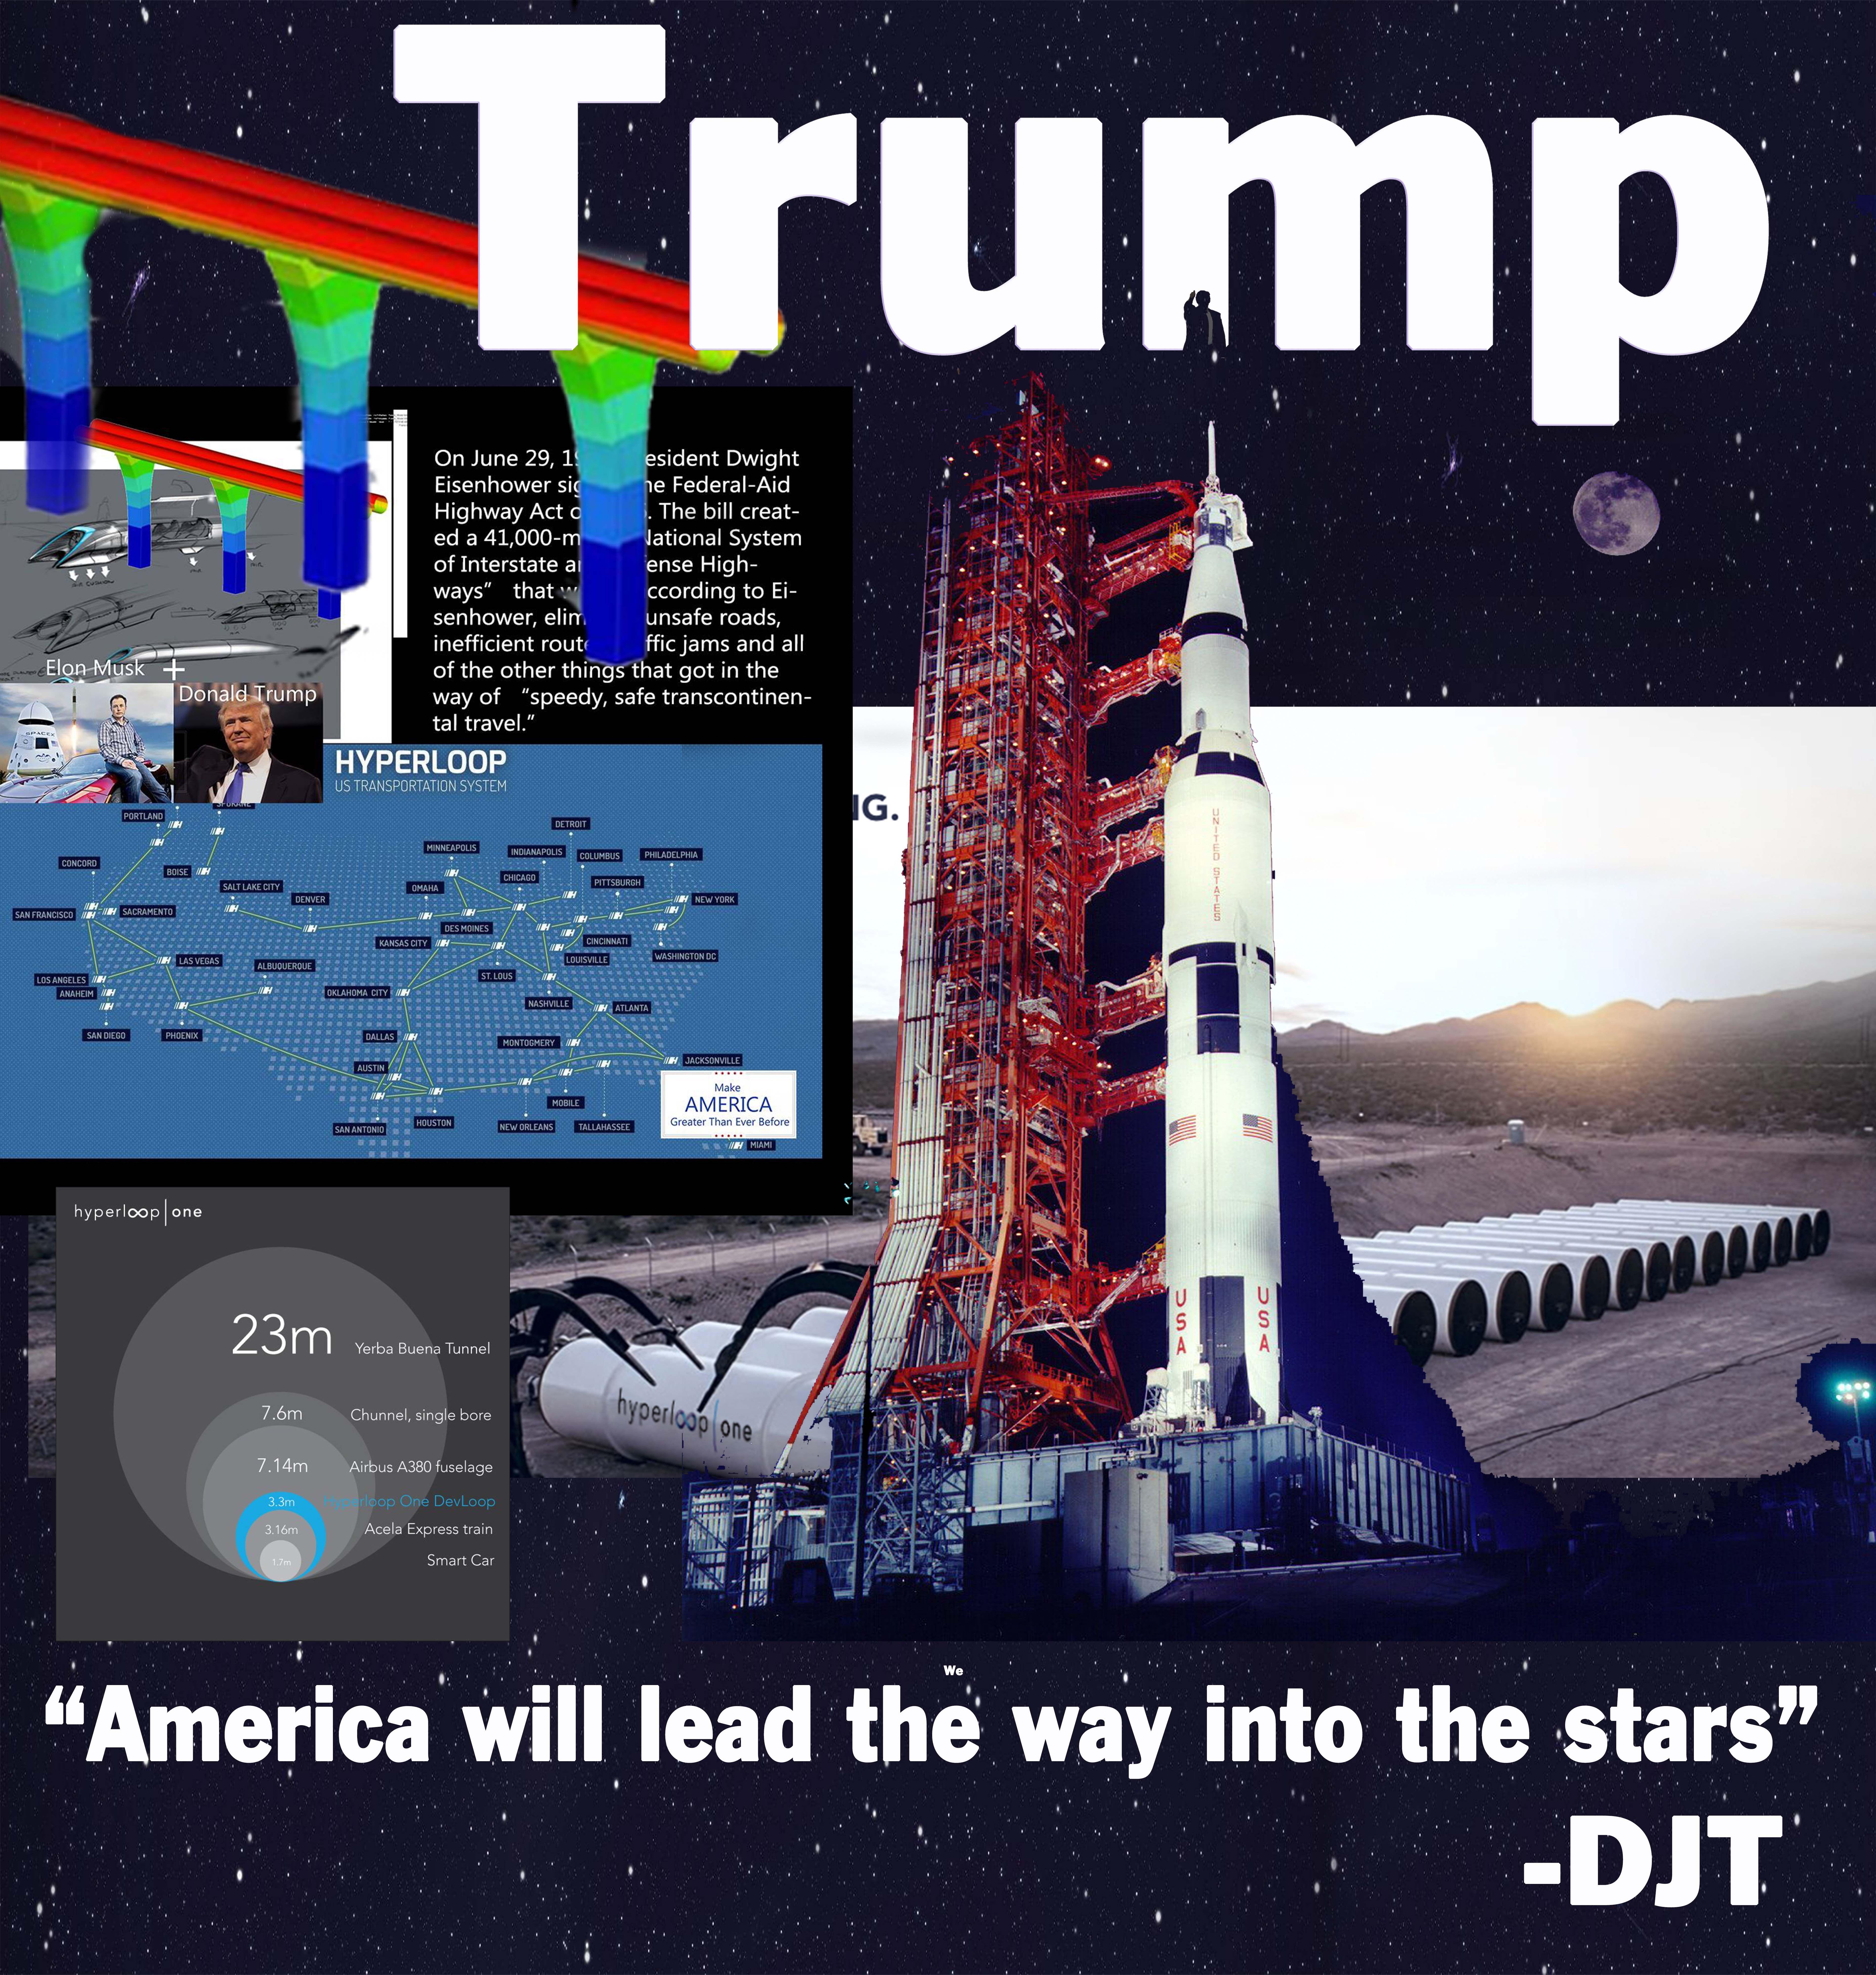 #Trump Addressing #Future #Technology #Space #Exploration & New #Infrastructure     #Vote #DJT|@realDonaldTrump    https://www.c-span.org/video/?417444-1/donald-trump-campaigns-sanford-florida&live&vod